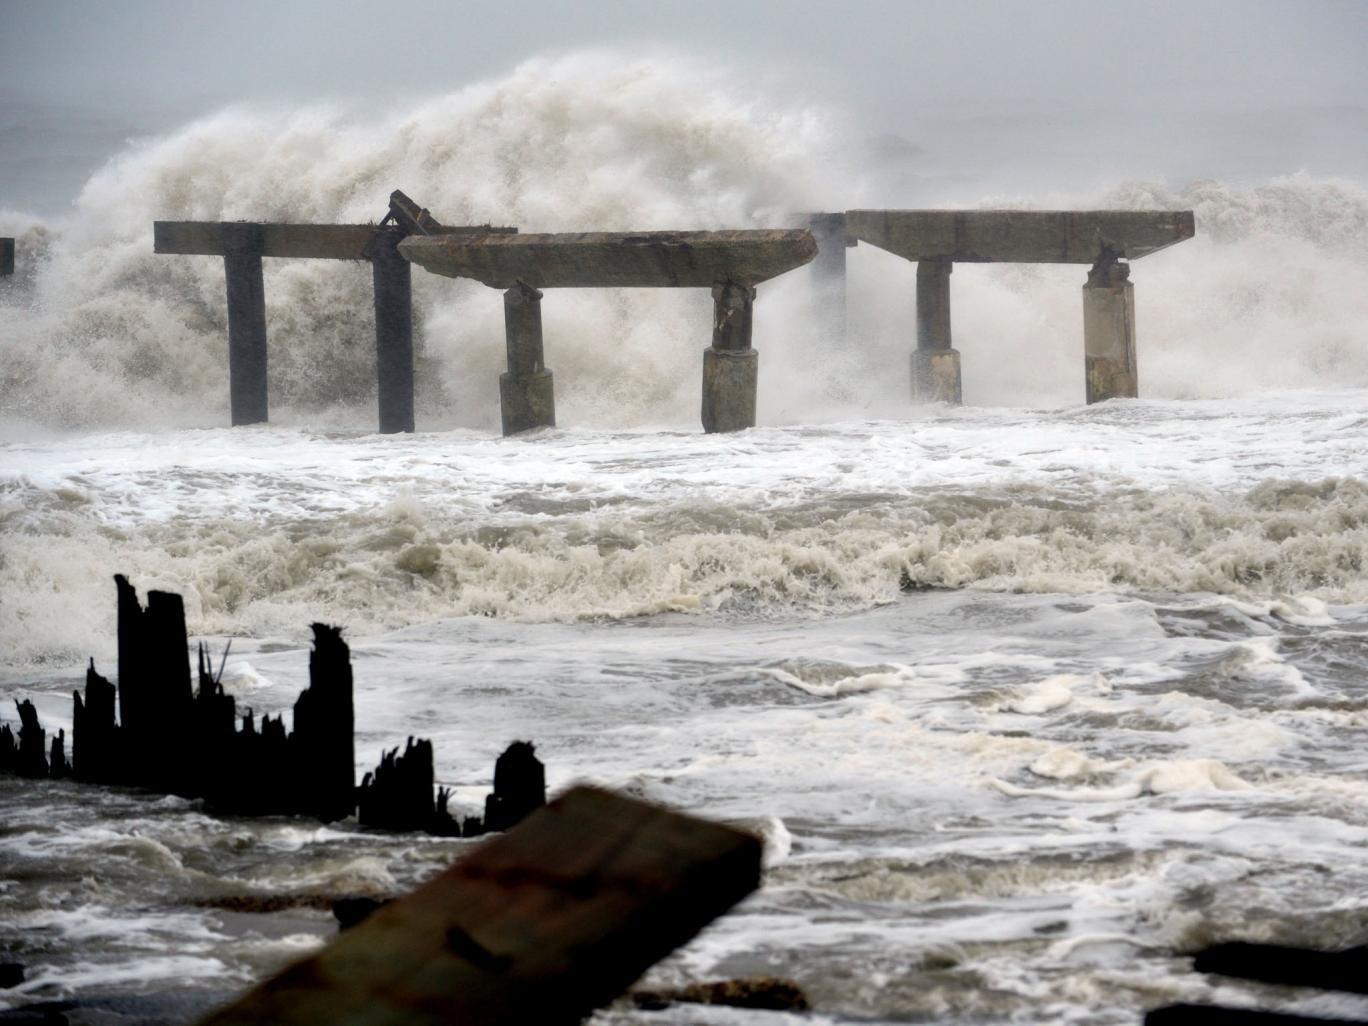 Superstorm Sandy lashes Atlantic City's coastline